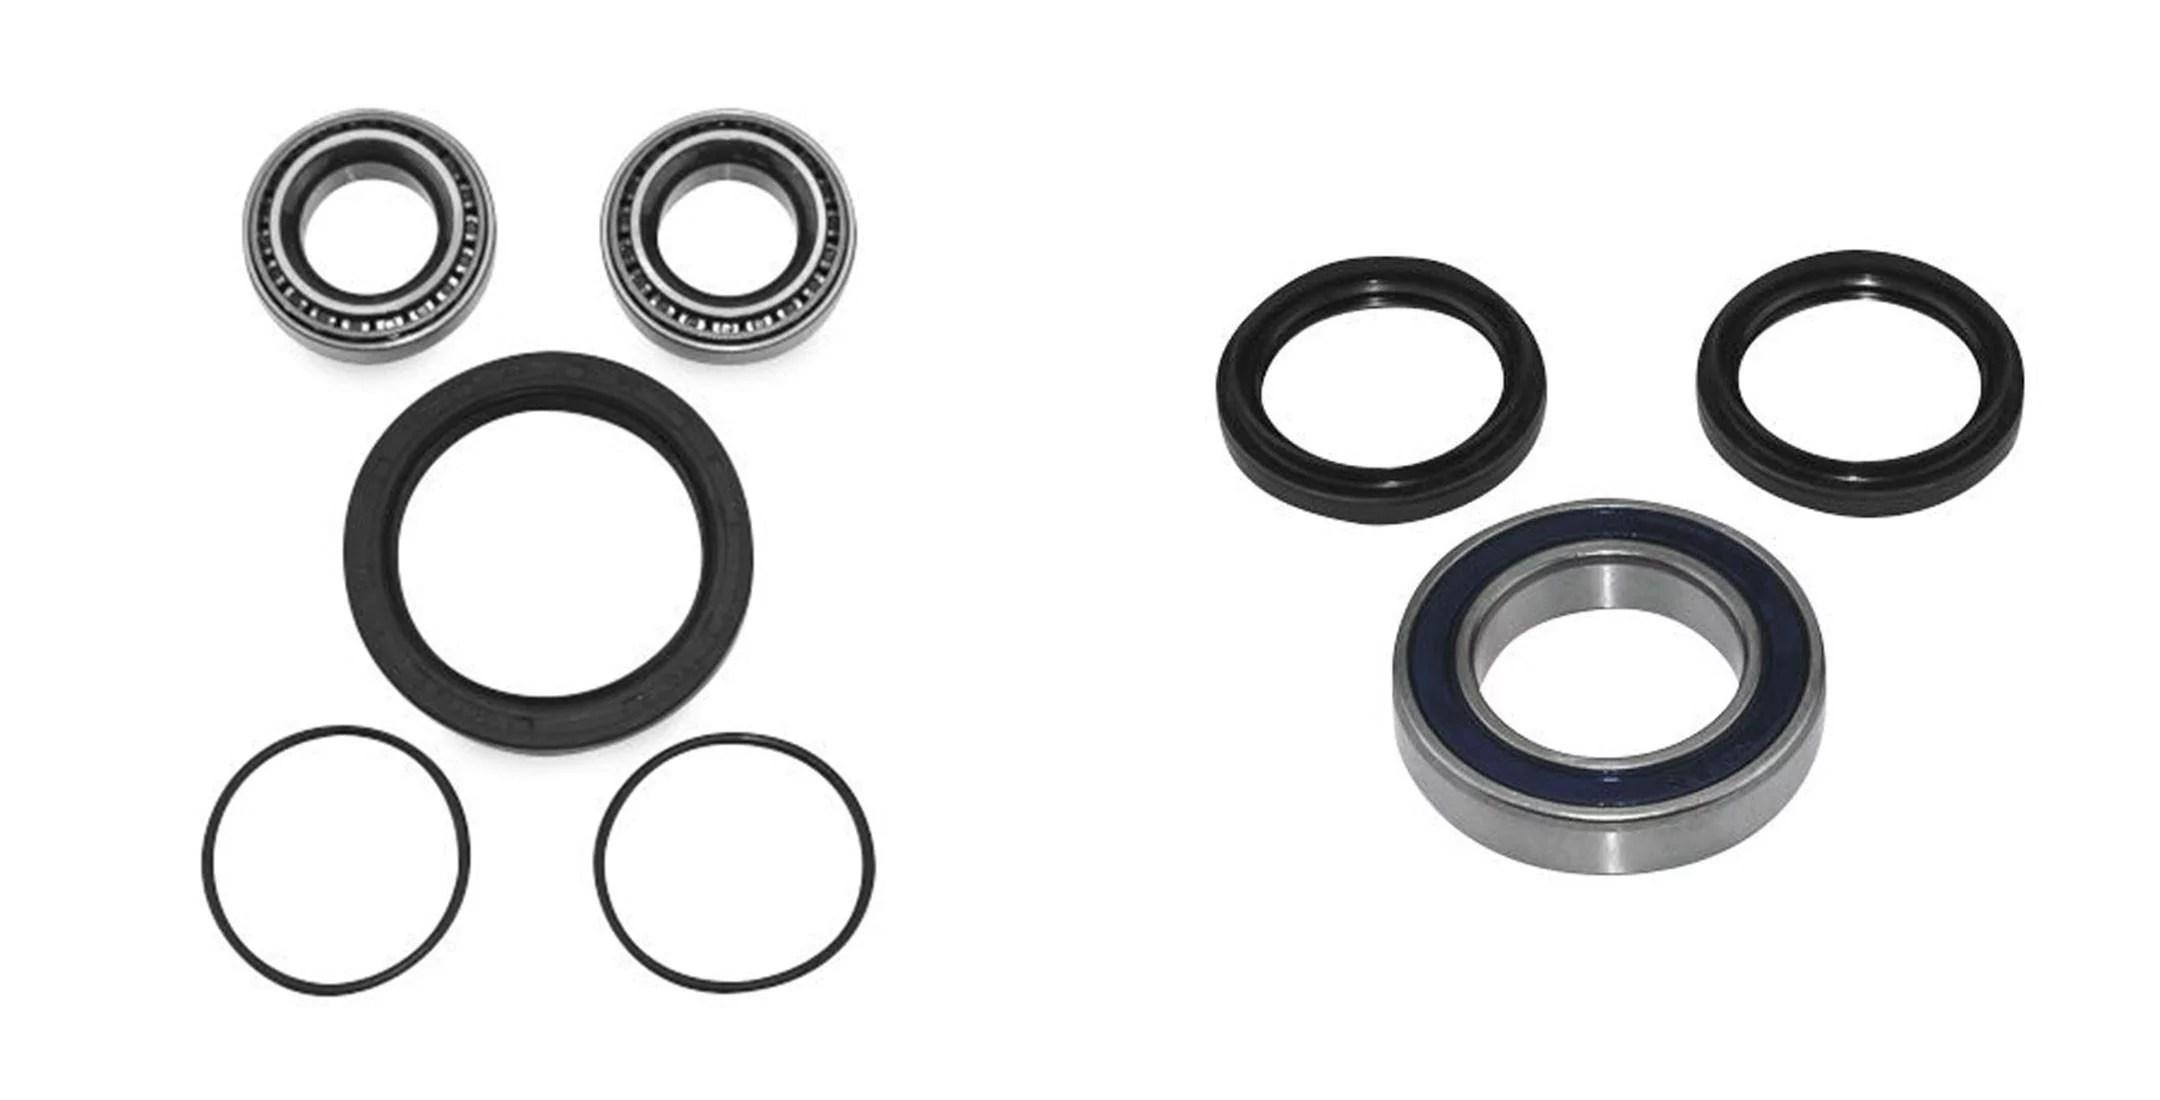 QUADBOSS Front and Rear Wheel Bearing Kits for Polaris